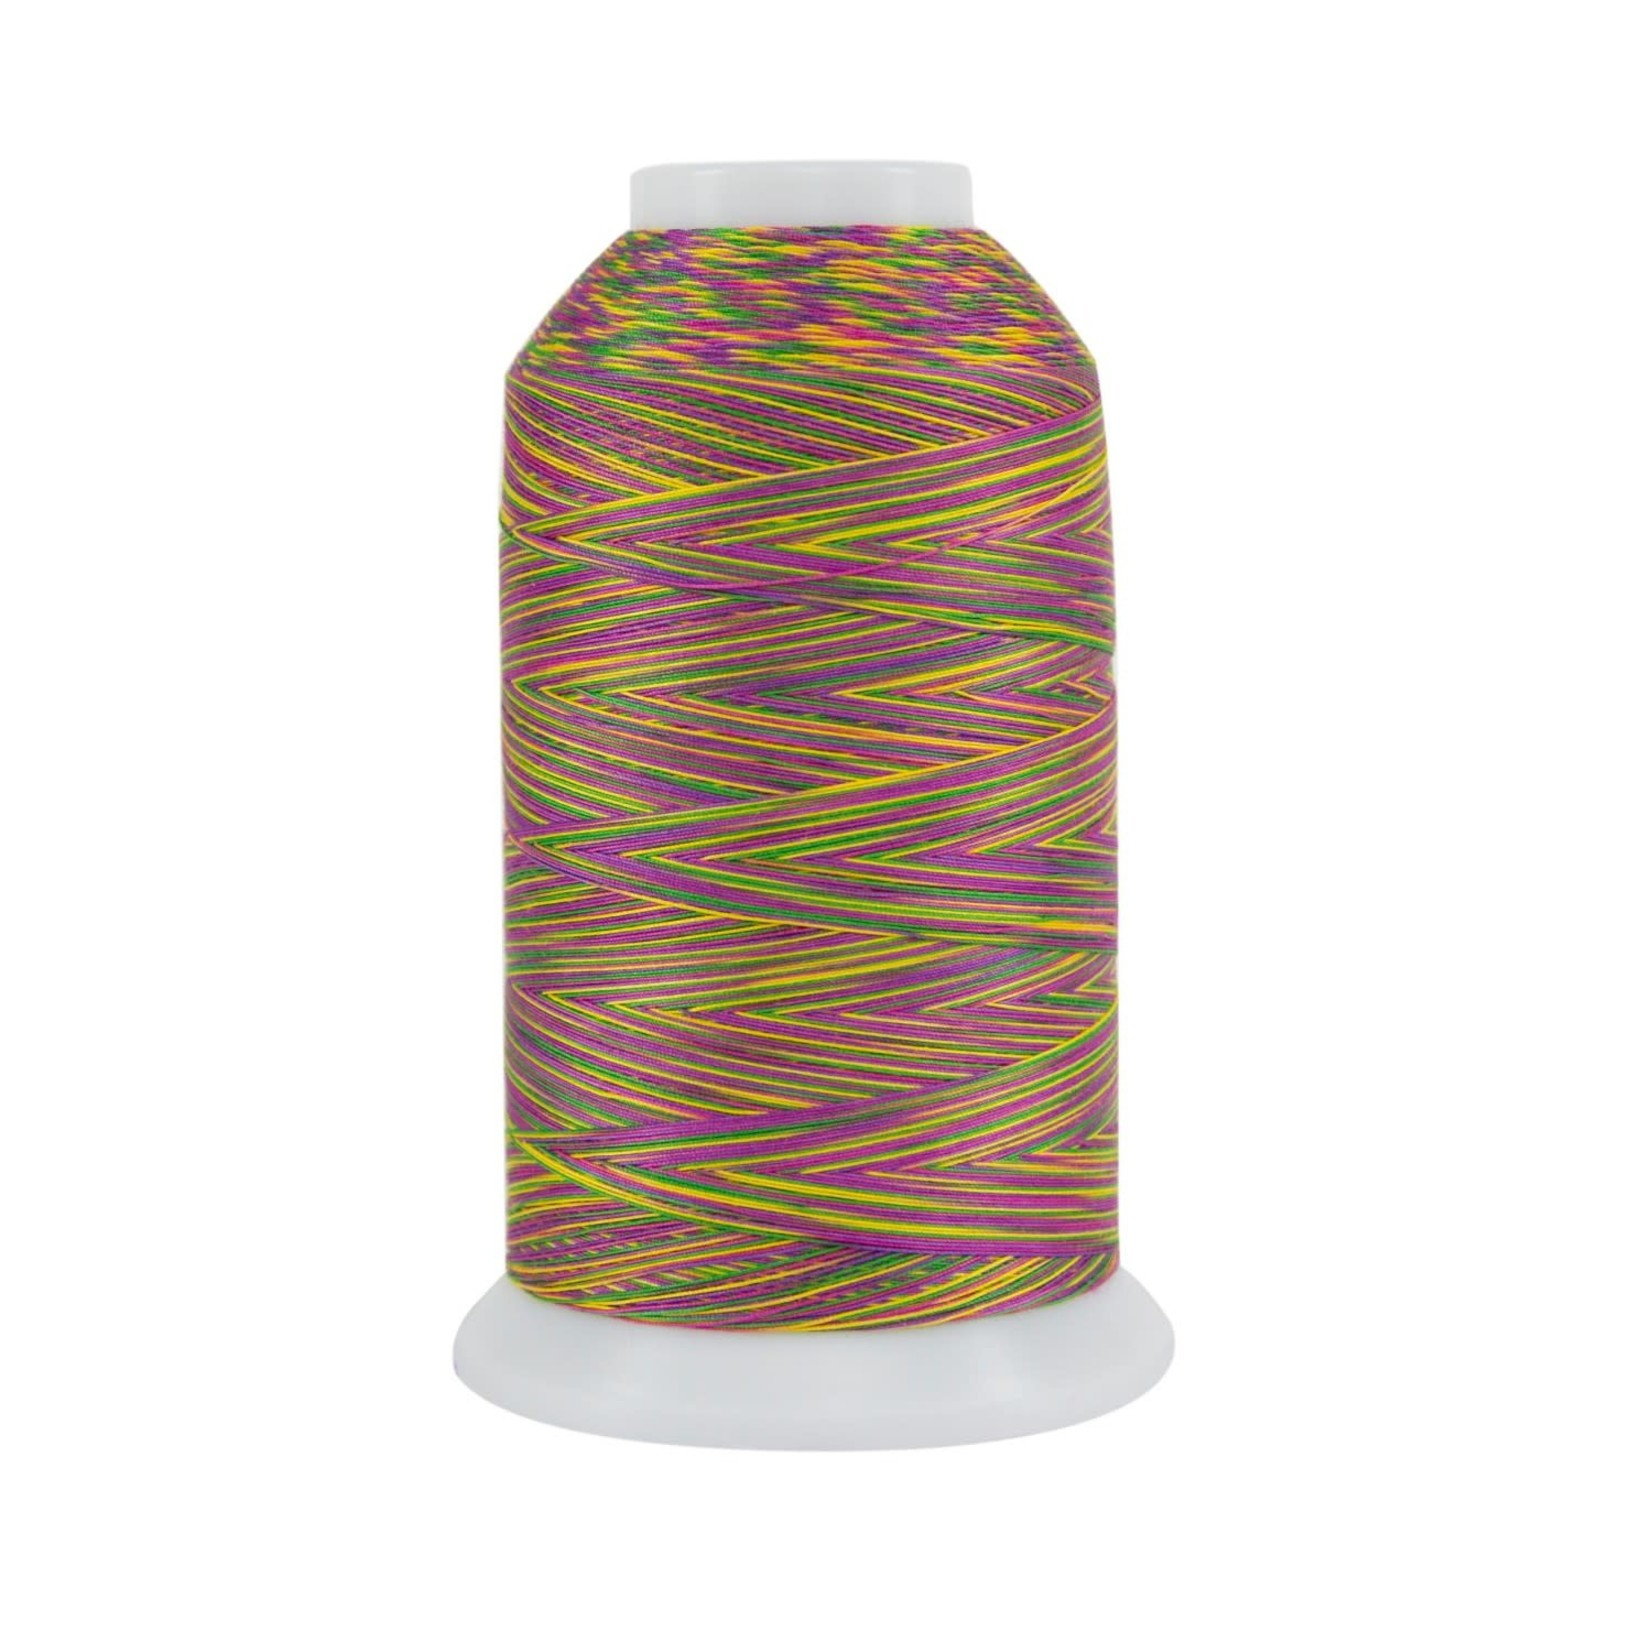 Superior Threads King Tut - #40 - 1828 m - 0901 Neferti